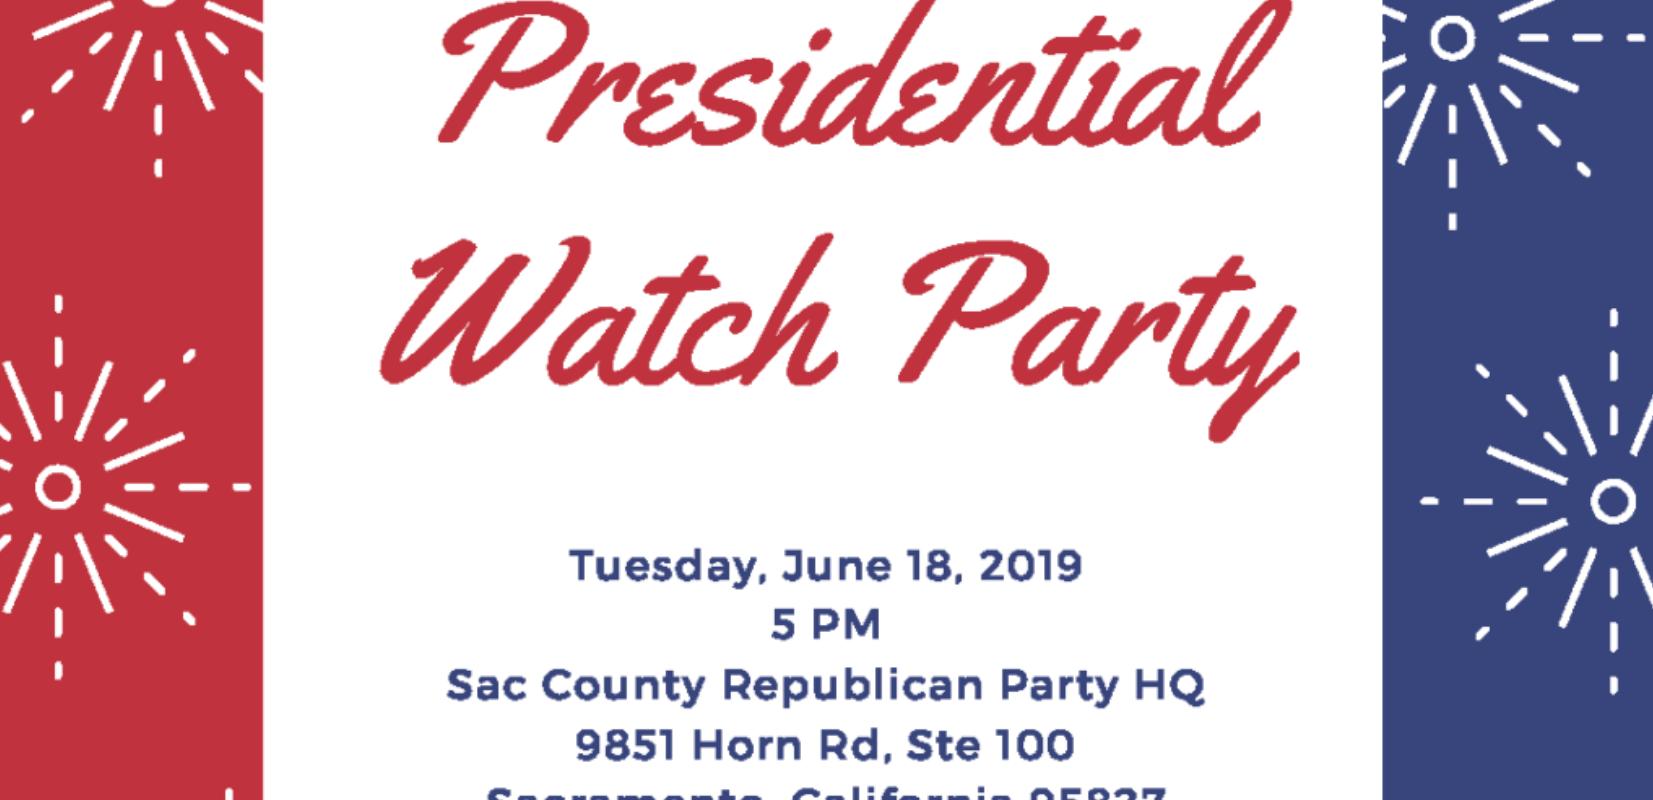 Trump 2020 Sacramento Watch Party at Republican Party HQ